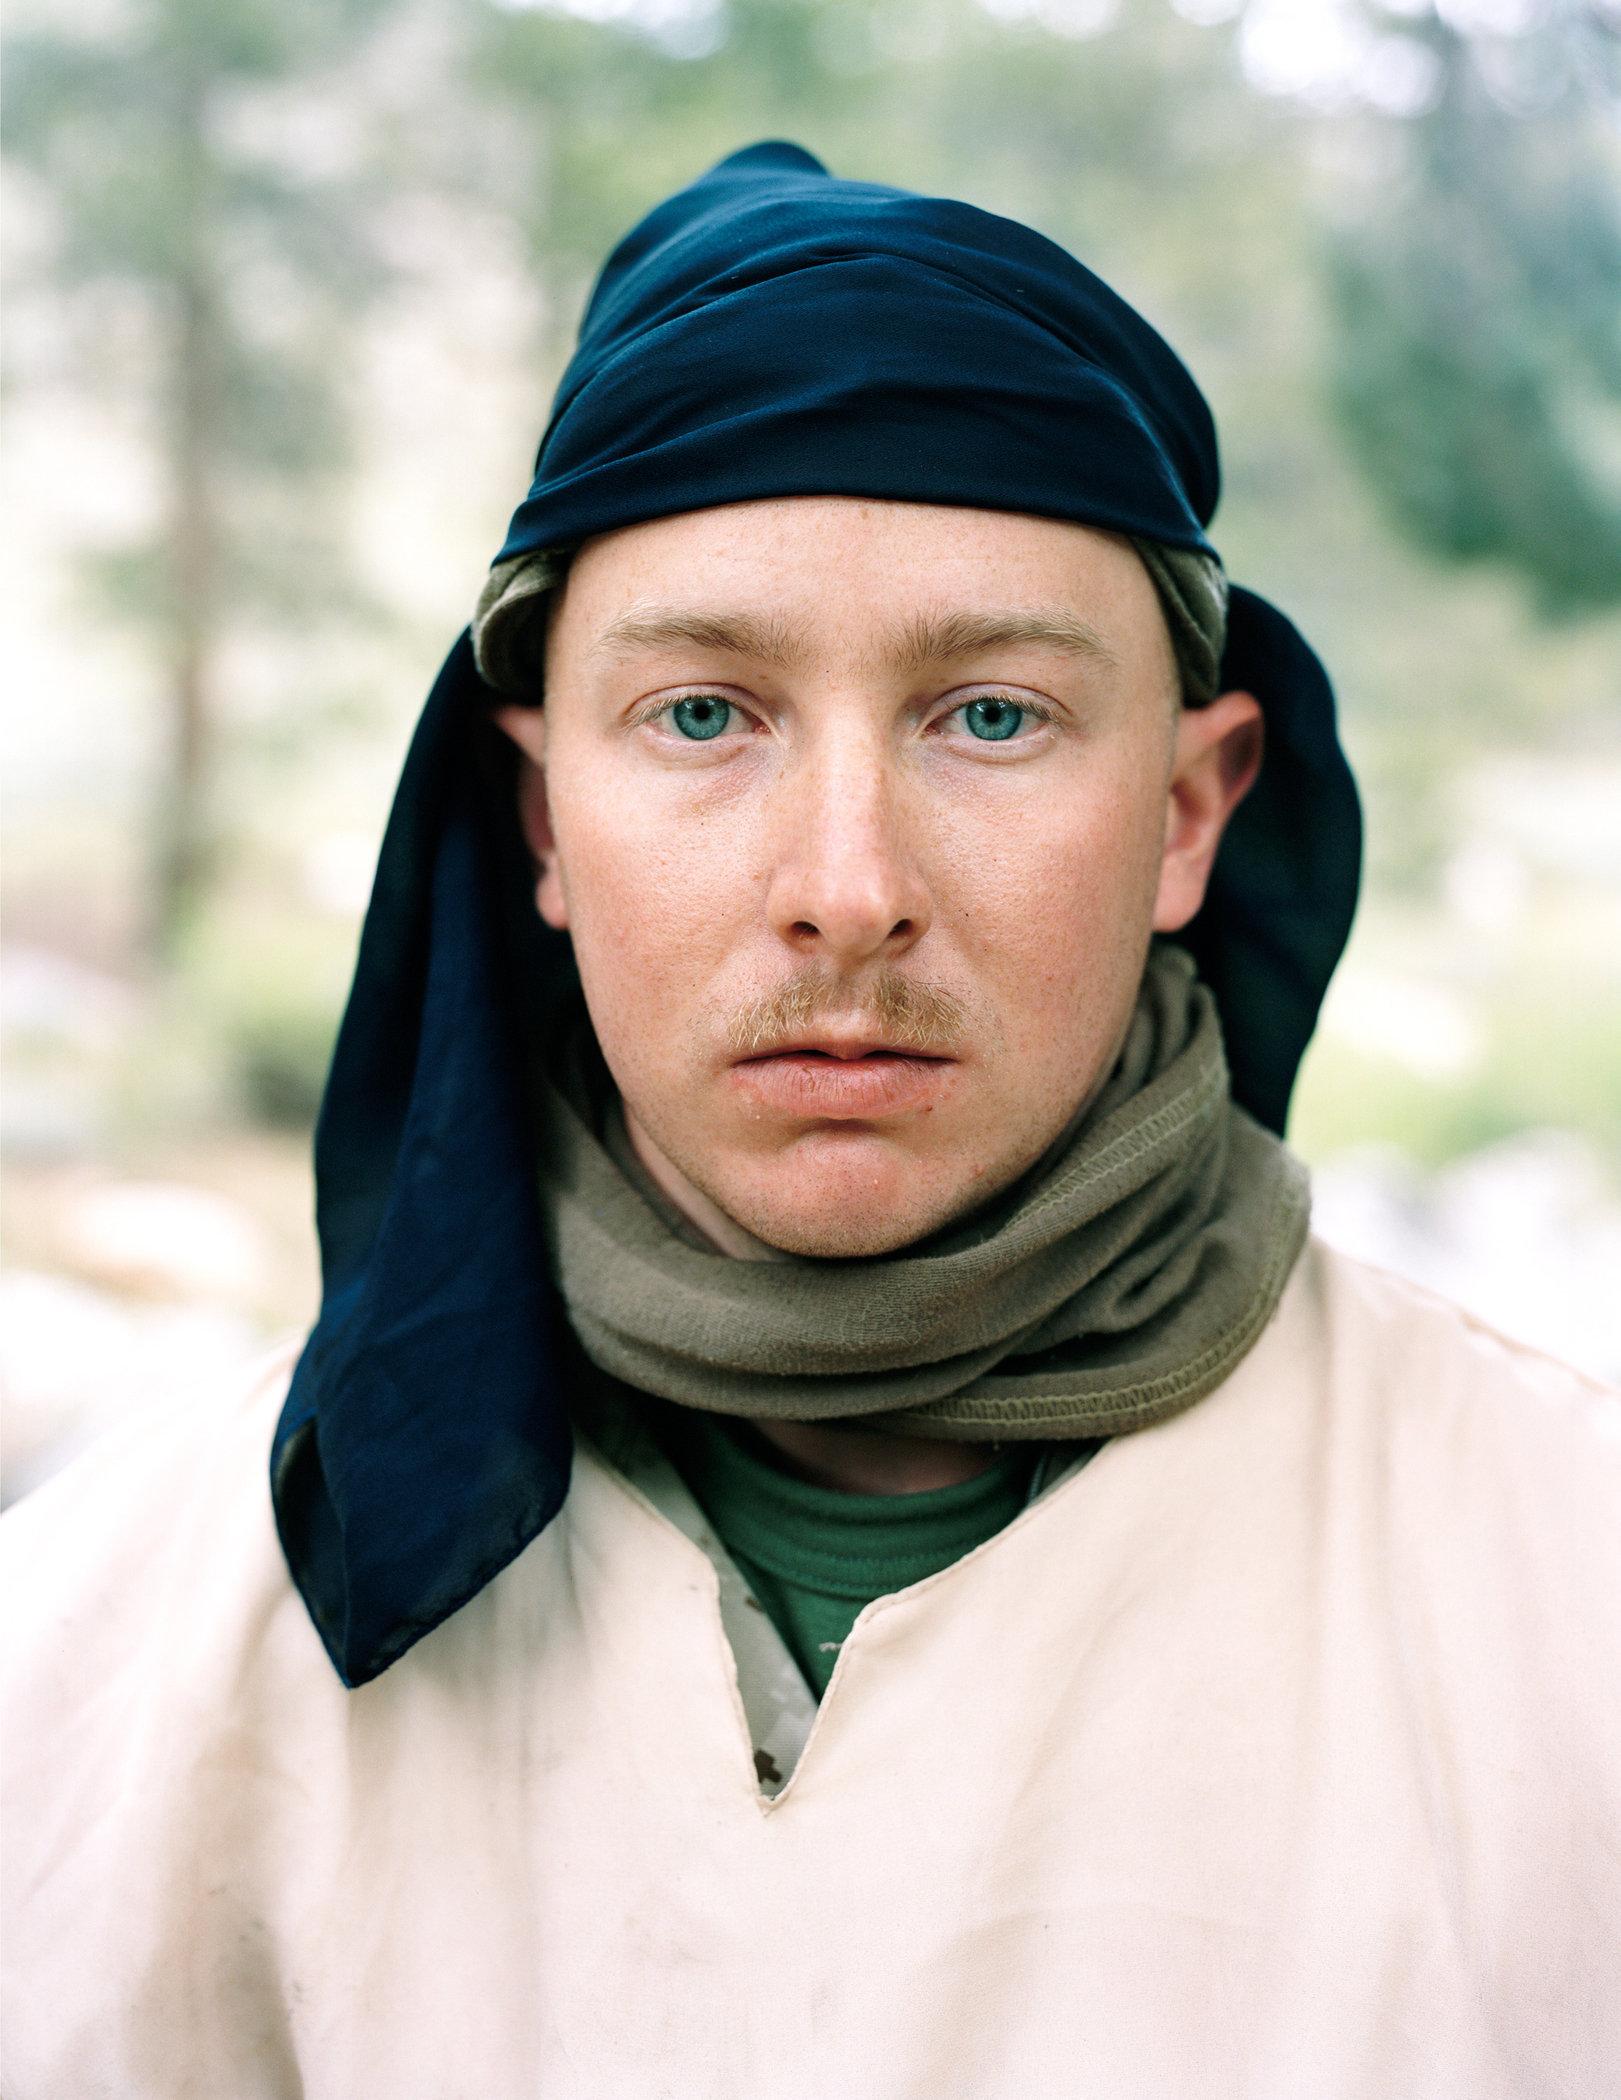 20_Beckett_Marine_jihadi2_Black_scarf.jpg